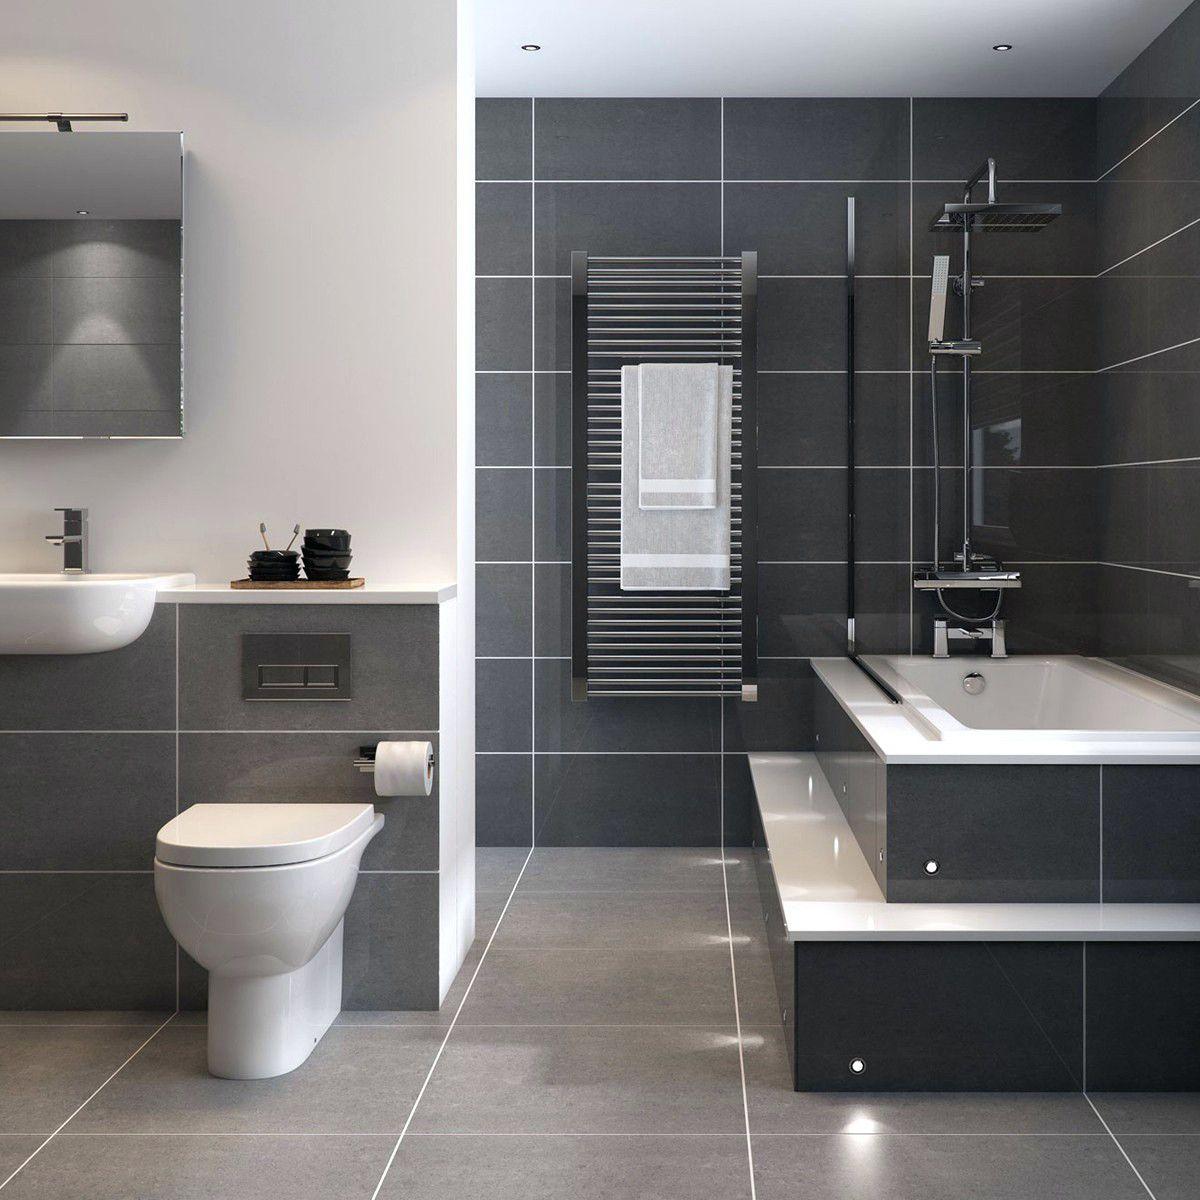 Image Result For Grey Bathroom Green Tiles Dark Gray Bathroom Gray Bathroom Decor Small Grey Bathrooms